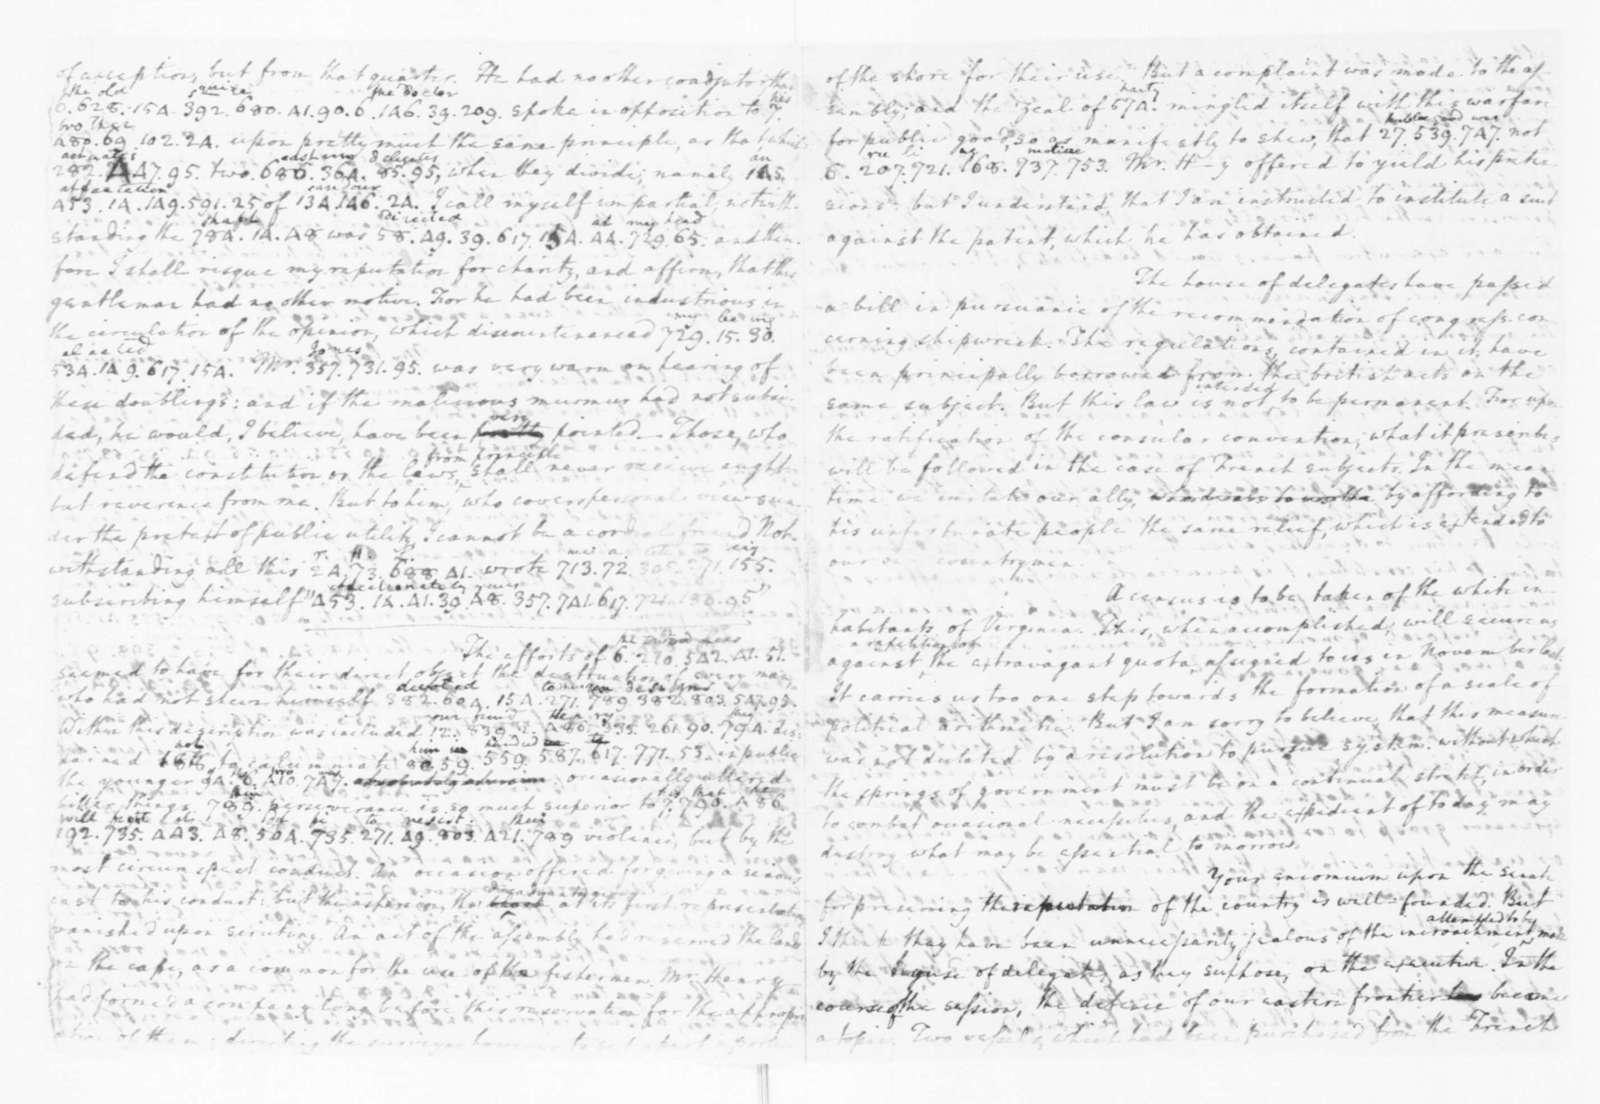 Edmund Randolph to James Madison, June 20, 1782.